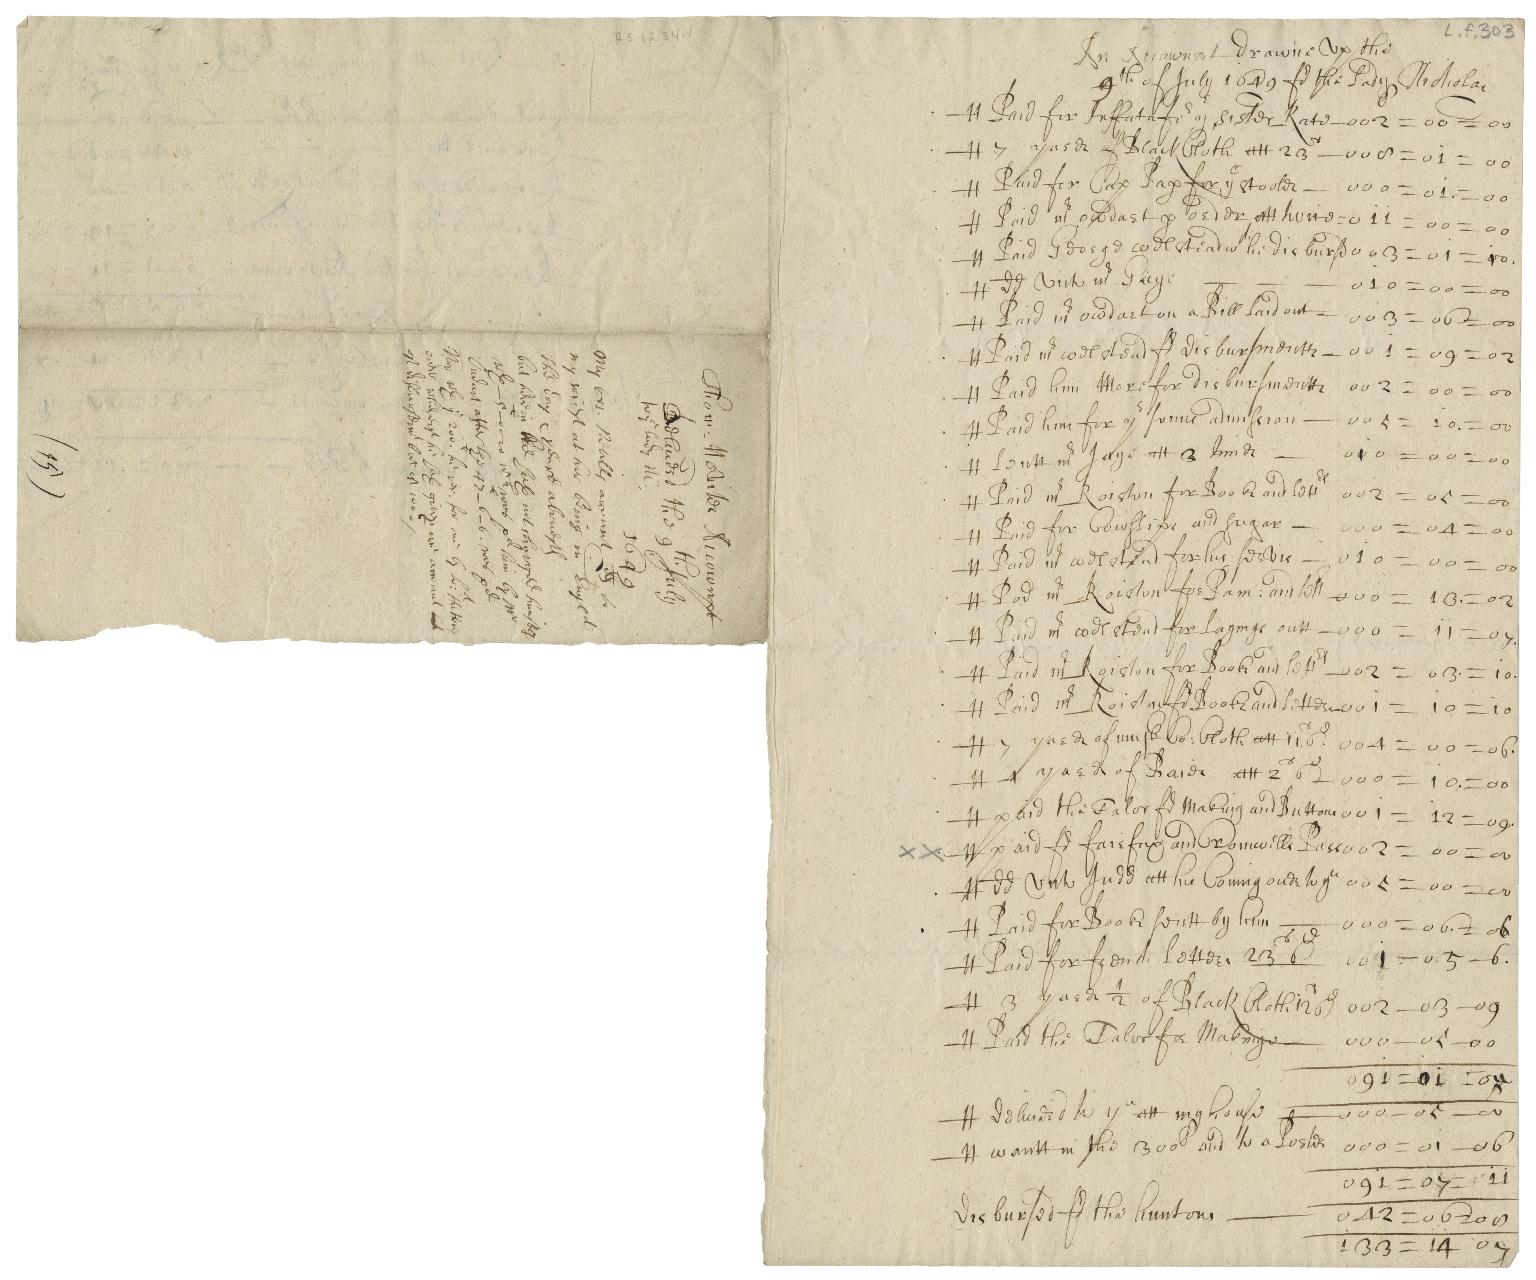 Accounts of Lady Nicholas